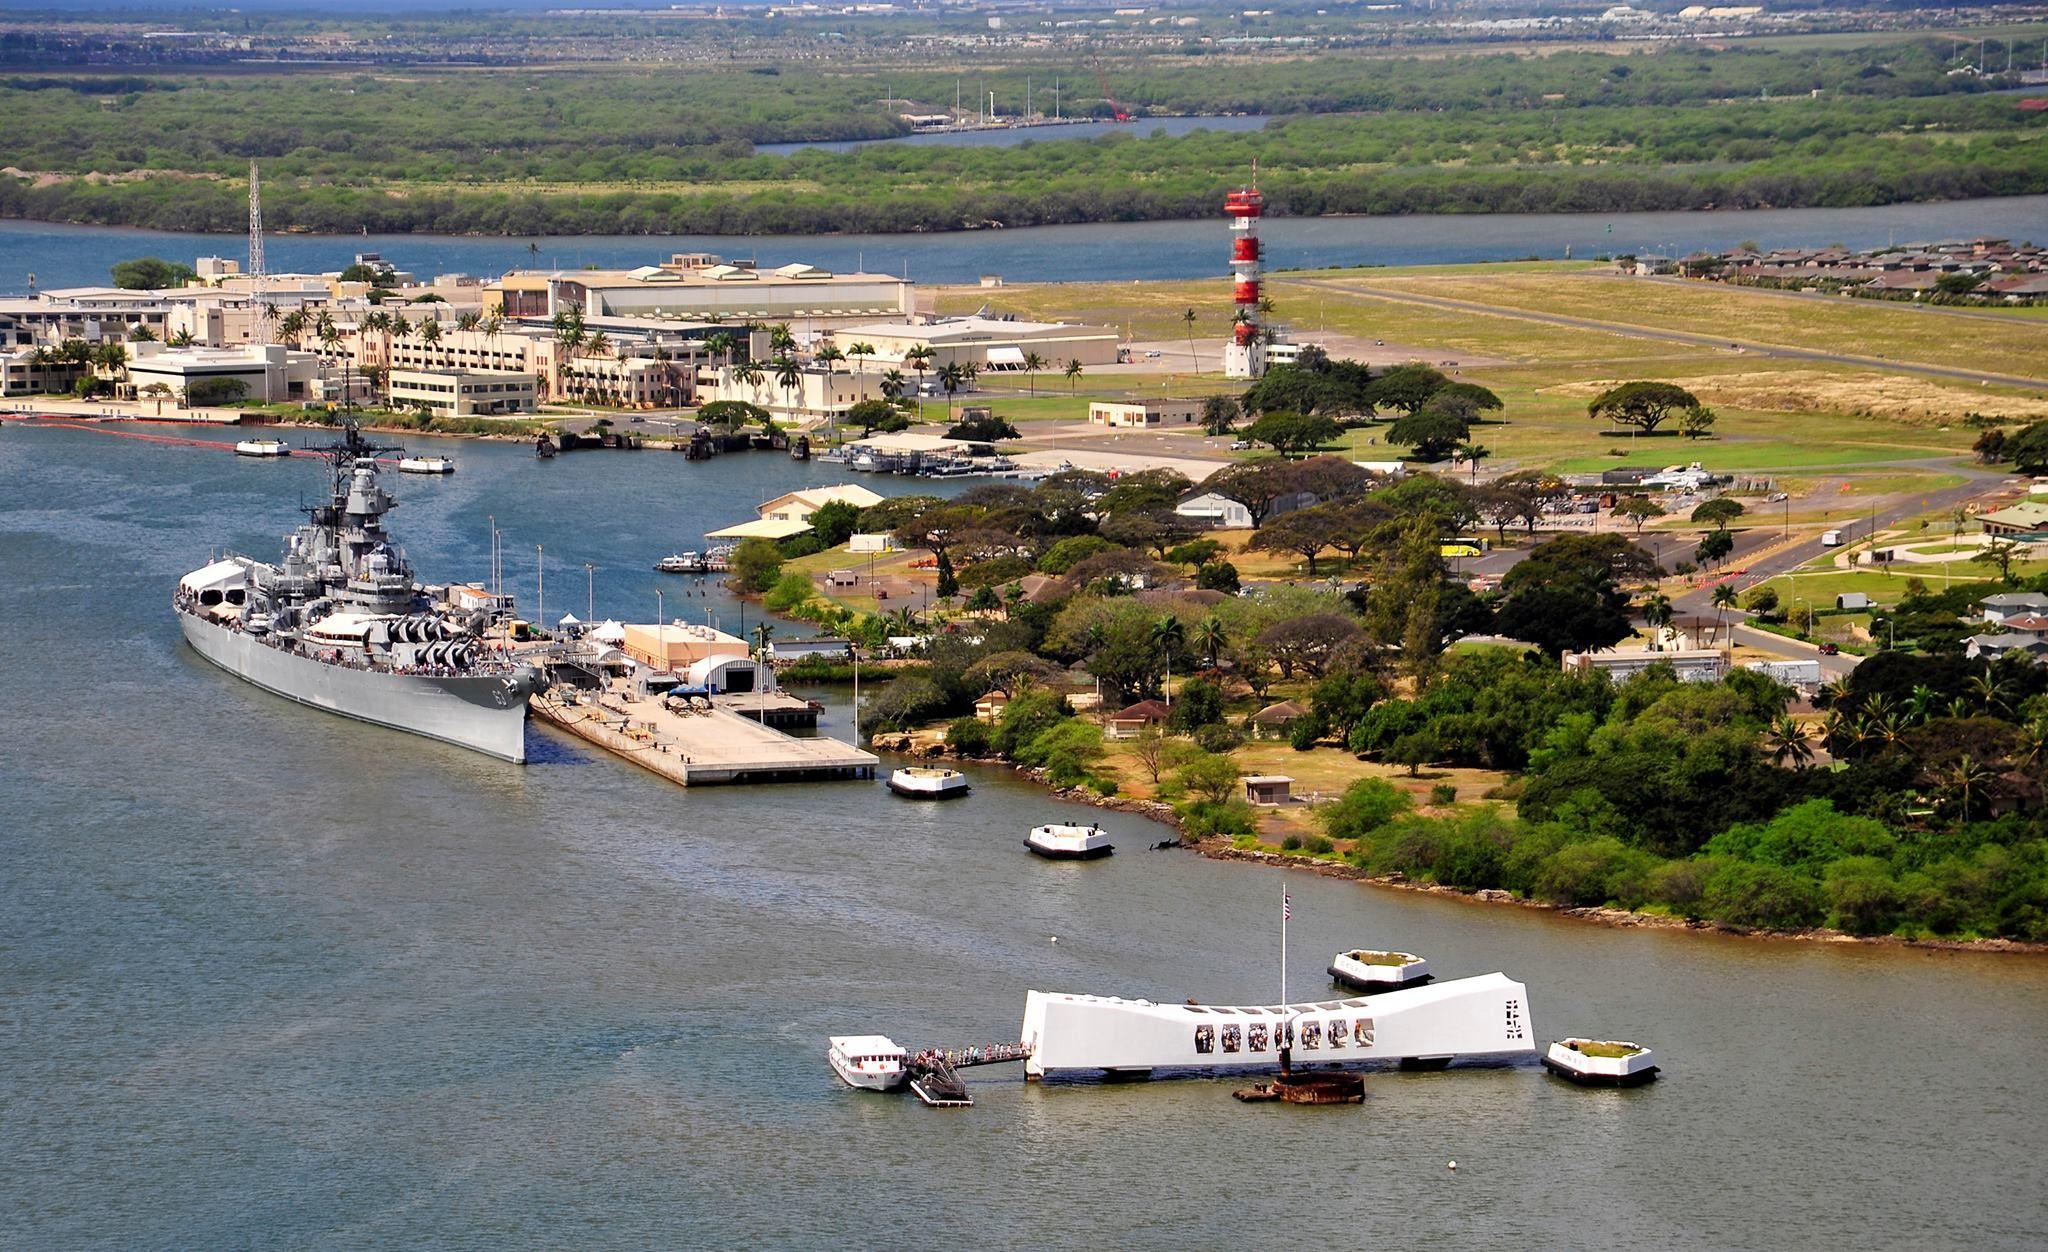 Beautiful aerial view of the USS Missouri behind the USS Arizona Memorial at Pearl Harbor.